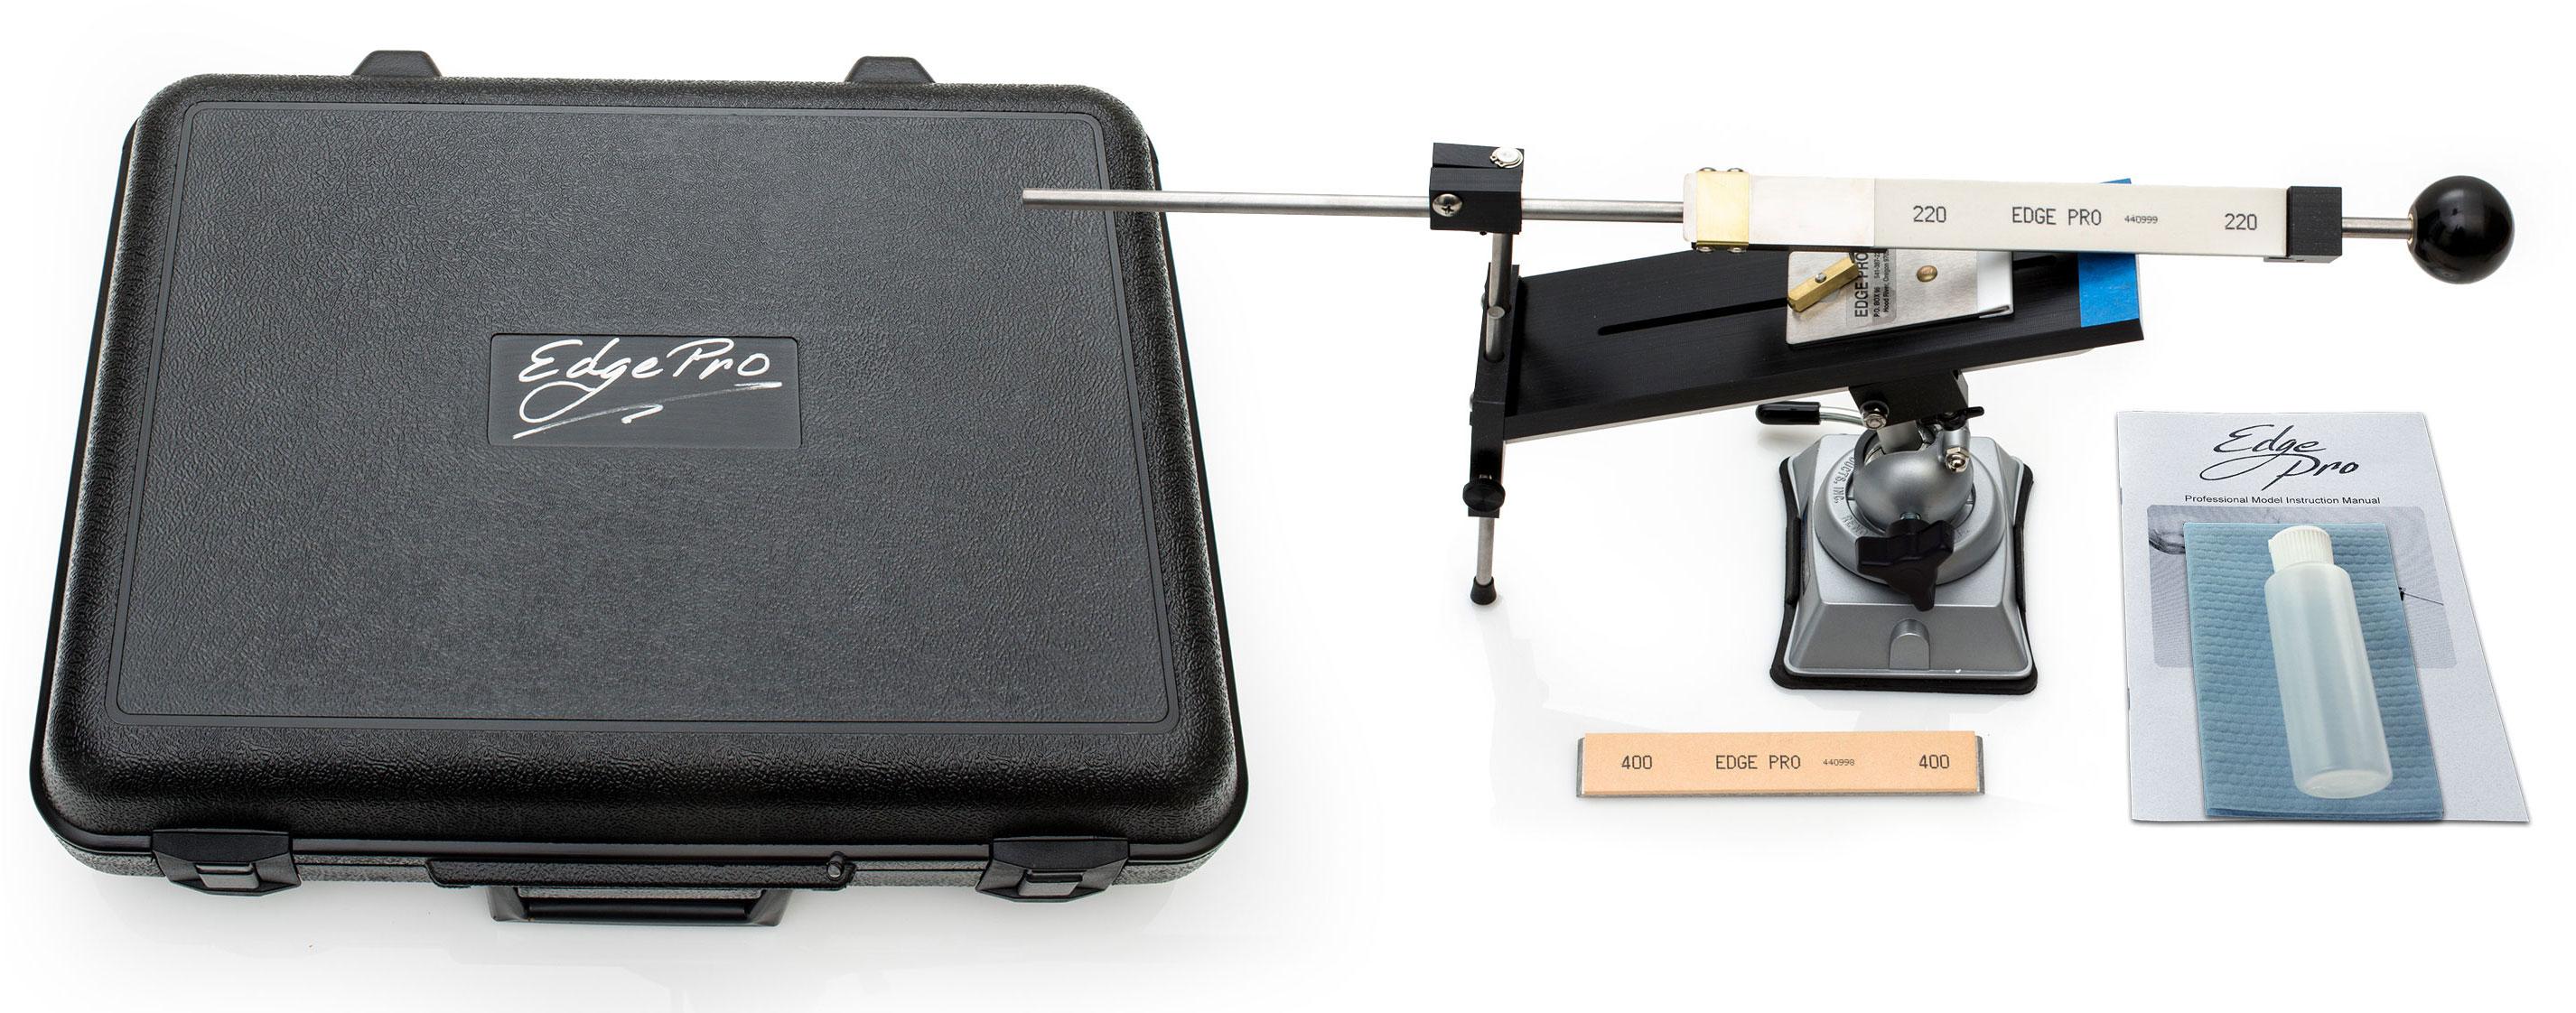 Edge Pro Professional 1 Knife Sharpening System